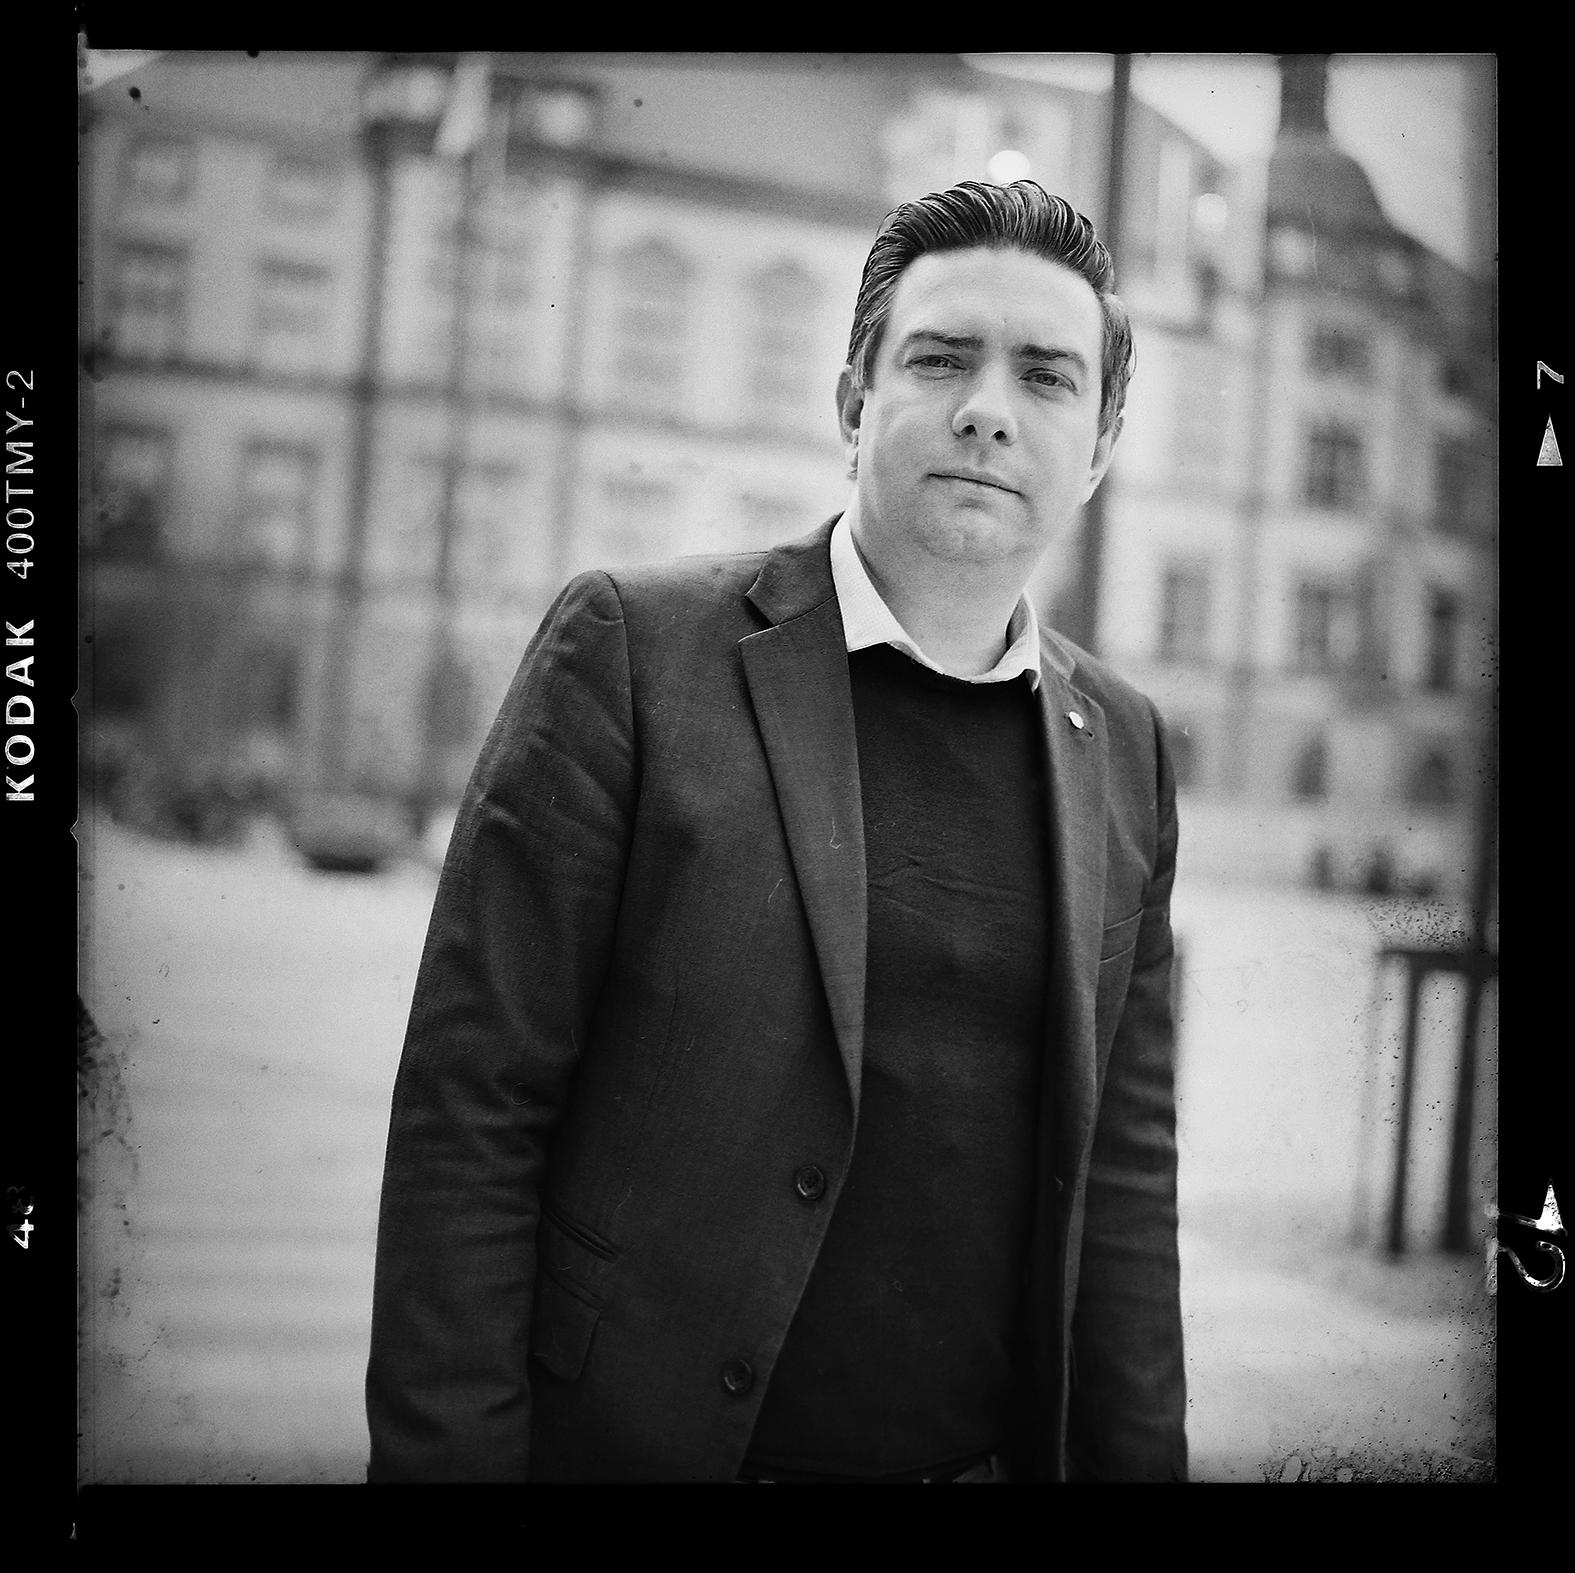 Jimmy Jansson Eskilstuna kommuns ordförande. Foto: Mikael Andersson, 2016-04-13. Hasselblad 500 cm med 80mm. Exponerad: 1/125 - f2,8